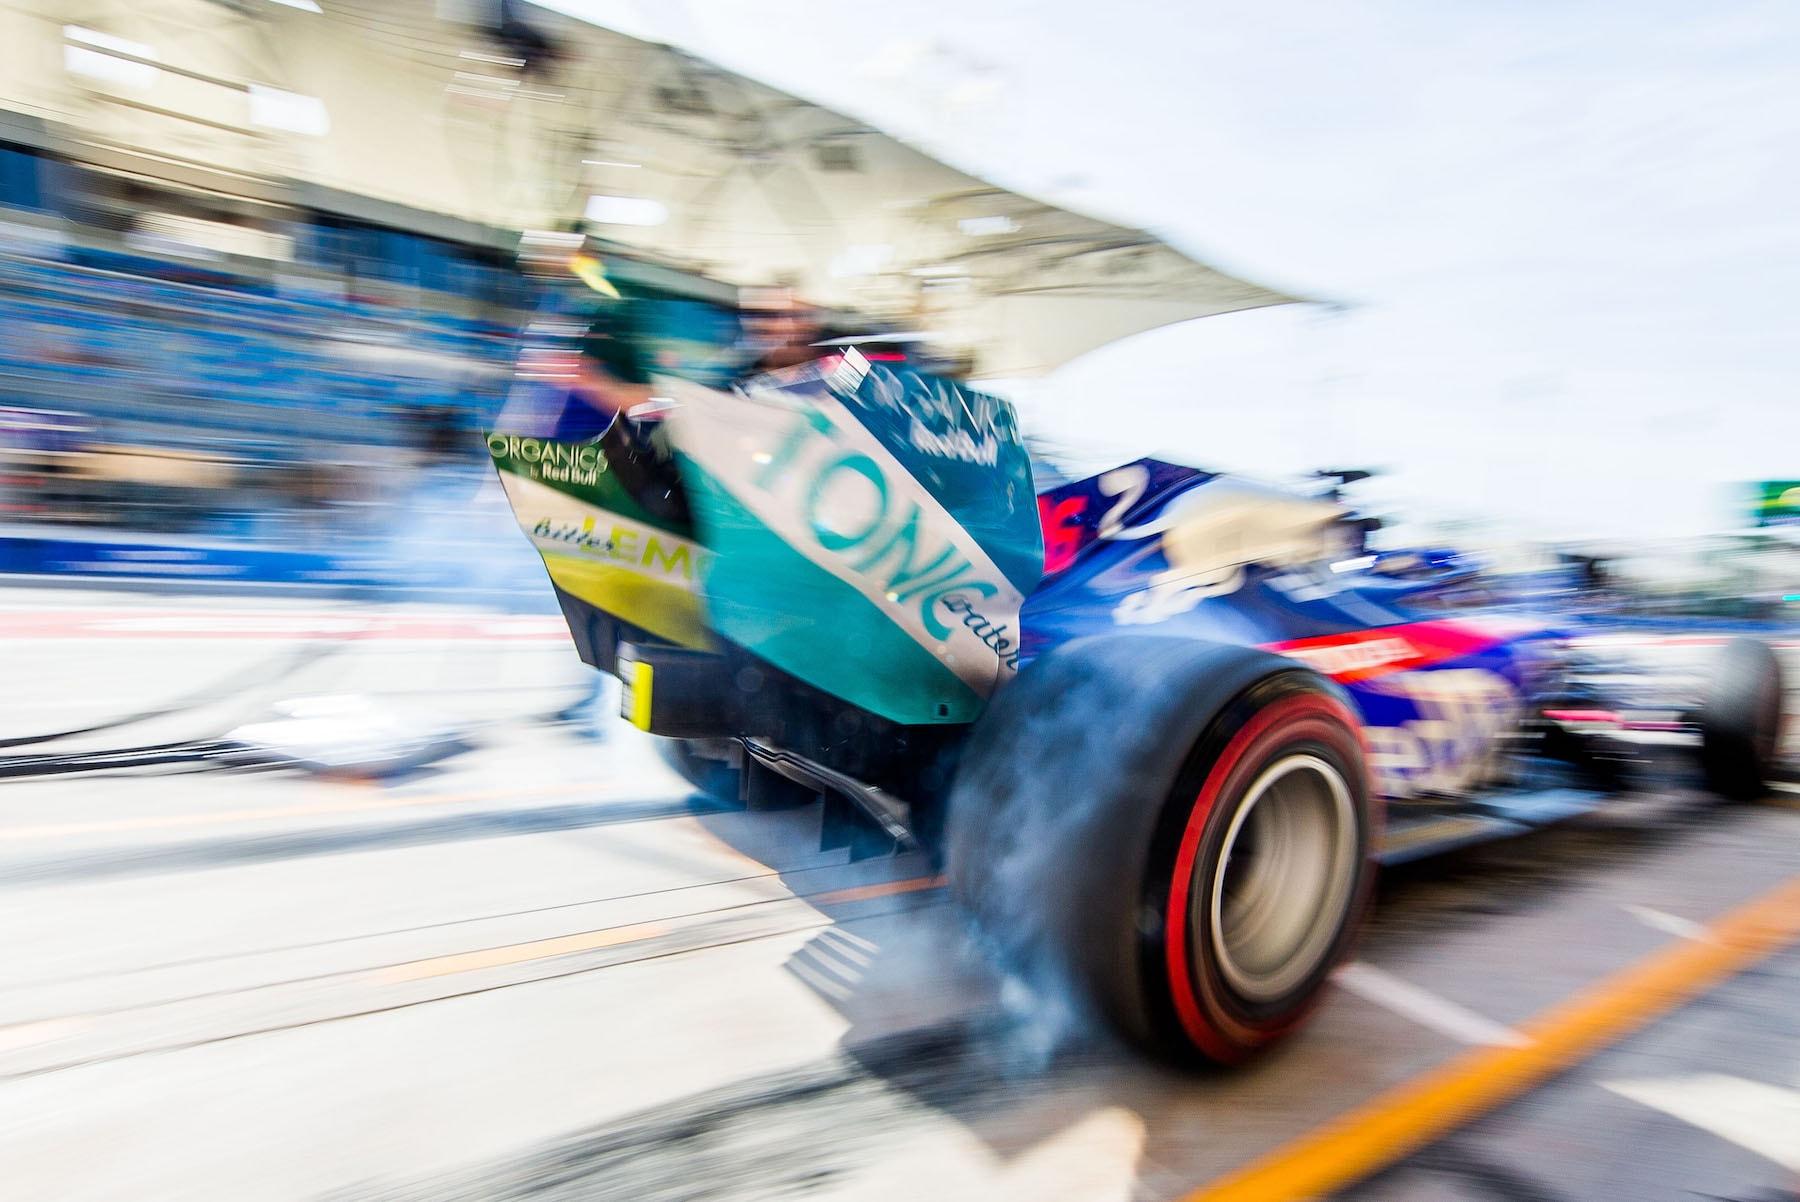 2 5 6 2019 Daniil Kvyat | Toro Rosso STR14 | 2019 Bahrain GP 1 copy.jpg